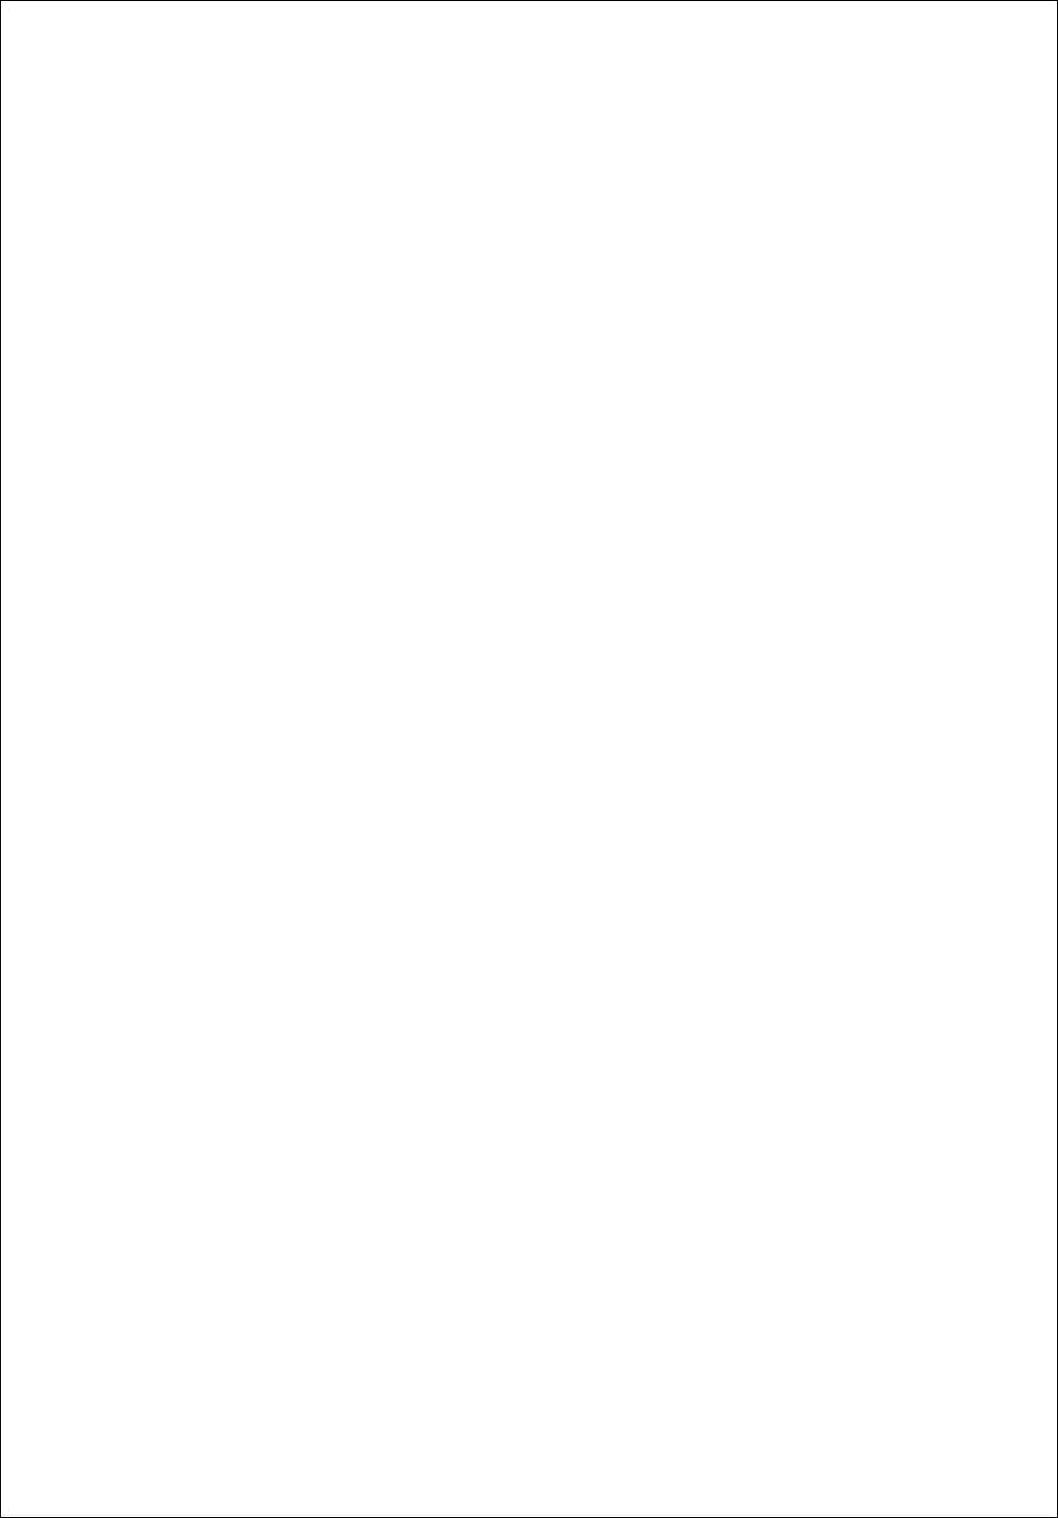 Hajimete no Sailor Fuku | Hajime's First Sailor Suit 1